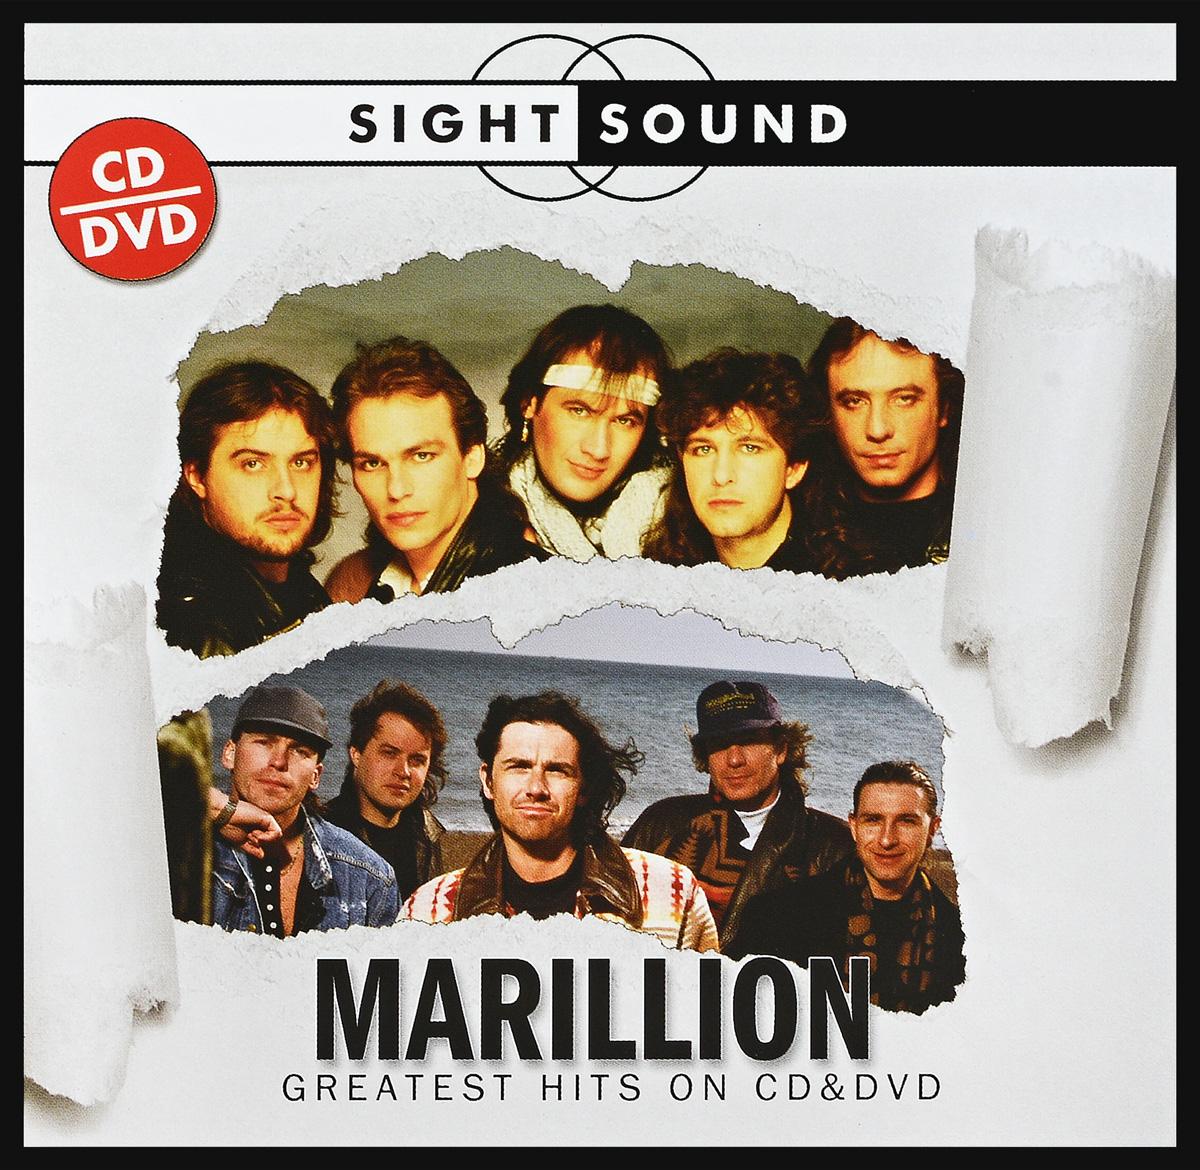 Marillion Marillion. Greatest Hits On CD & DVD (CD + DVD) цена